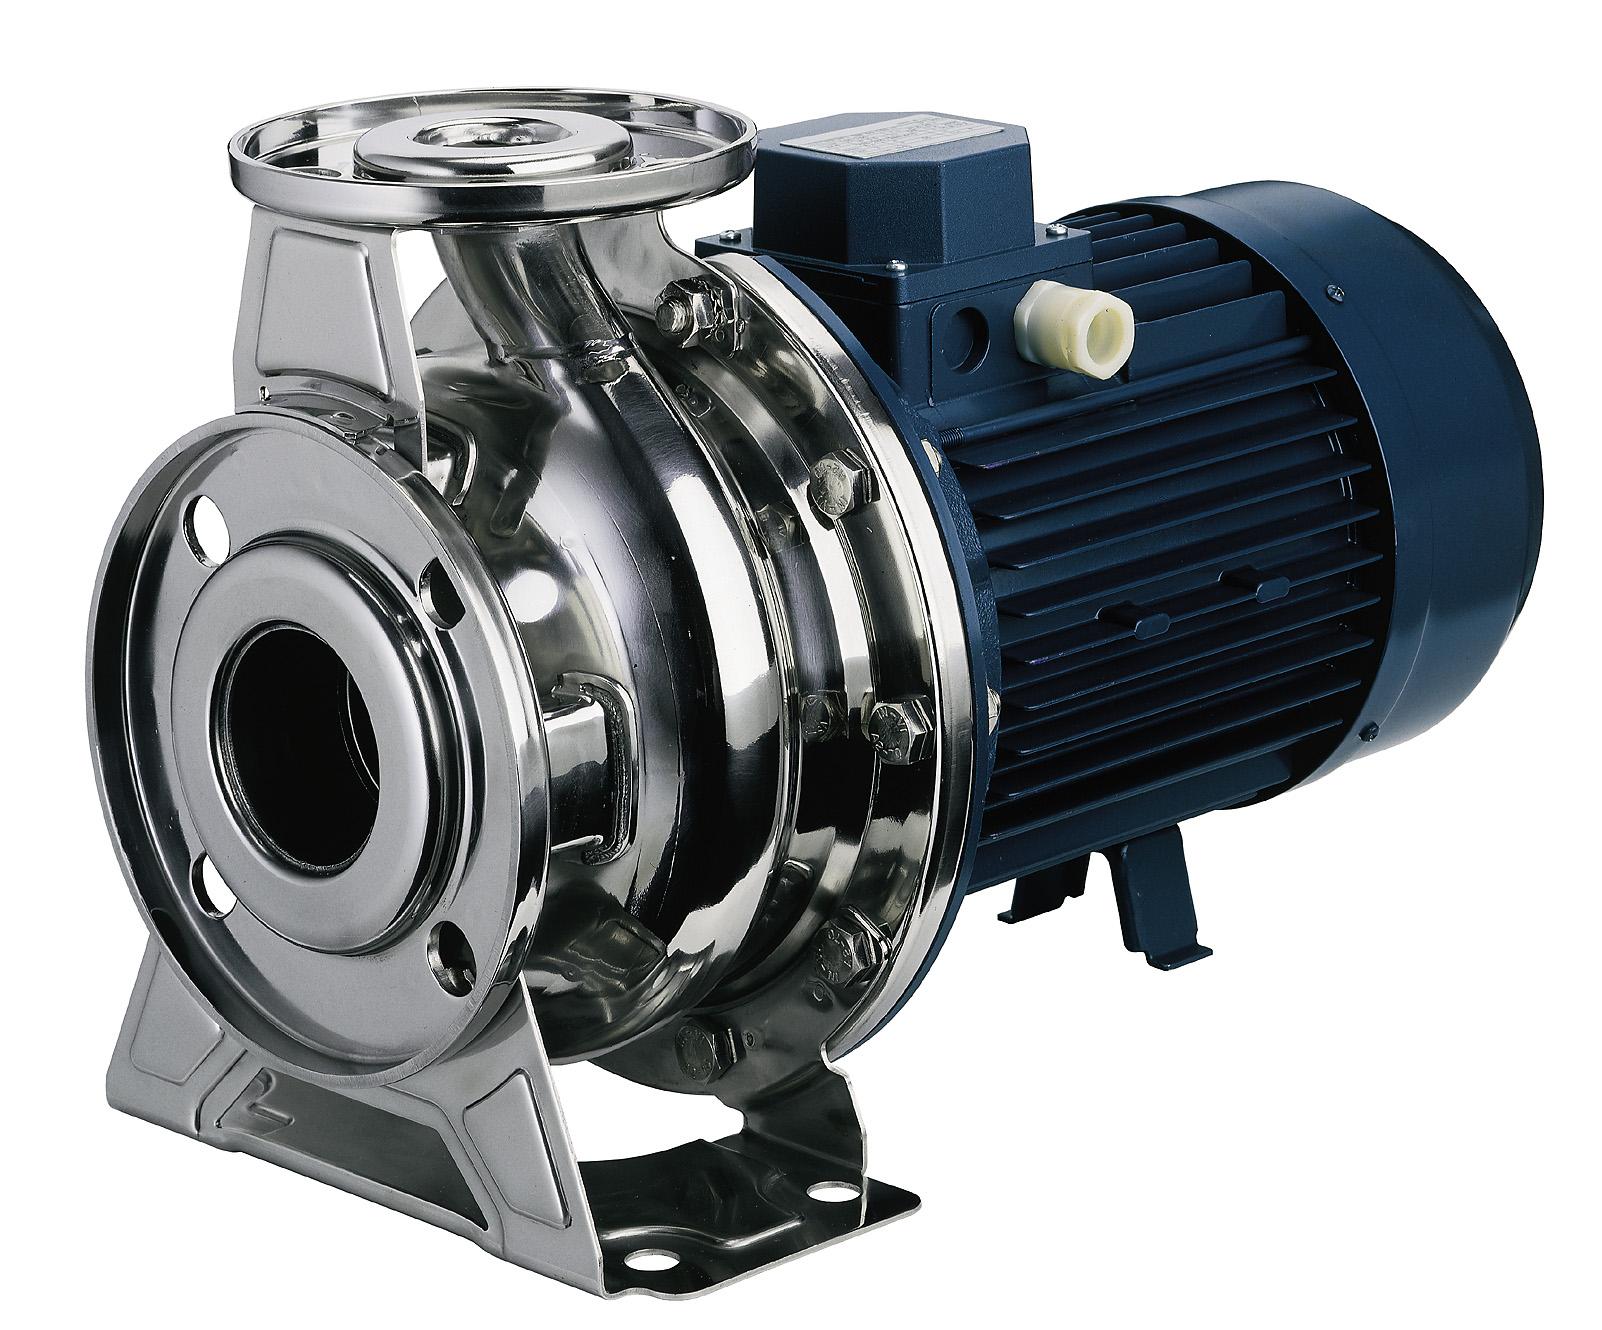 3M Monobloc Centrifugal Pumps, 2 pole - Ebara Pumps Australia